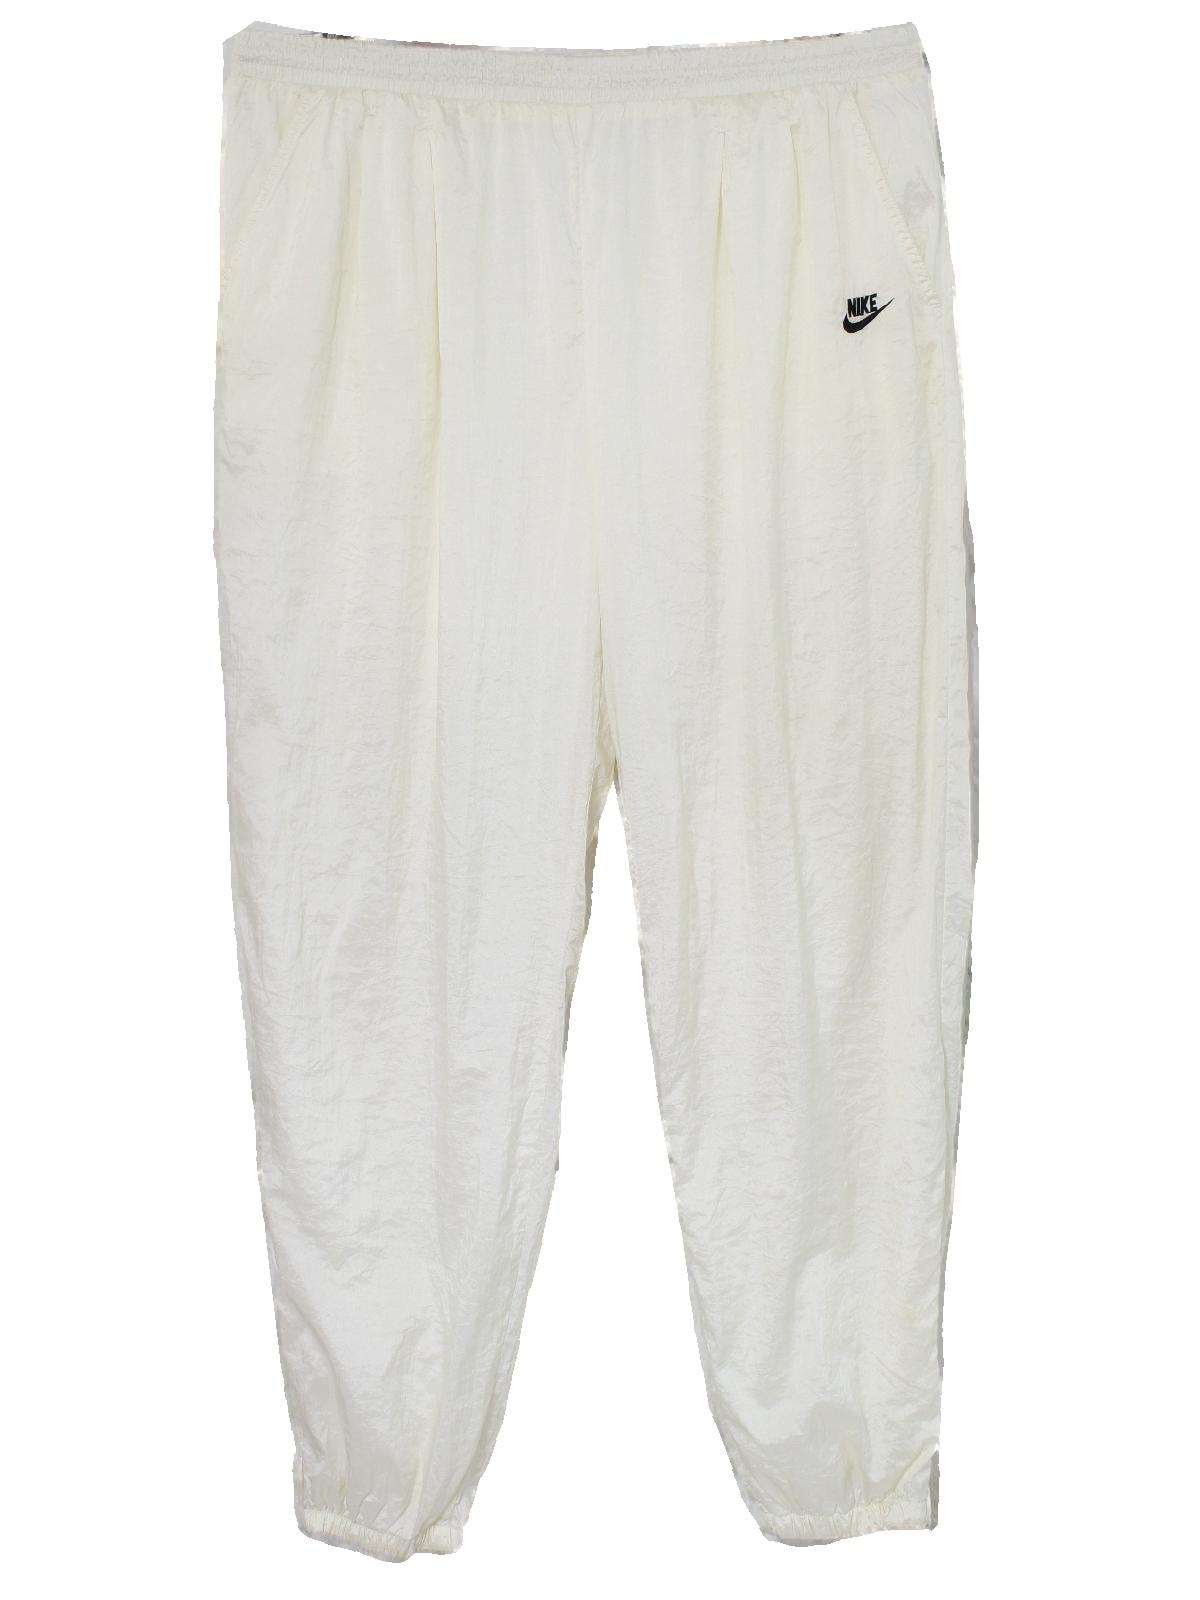 3e0adcb890cd3 Vintage Nike Eighties Pants: 80s -Nike- Mens white nylon shell ...